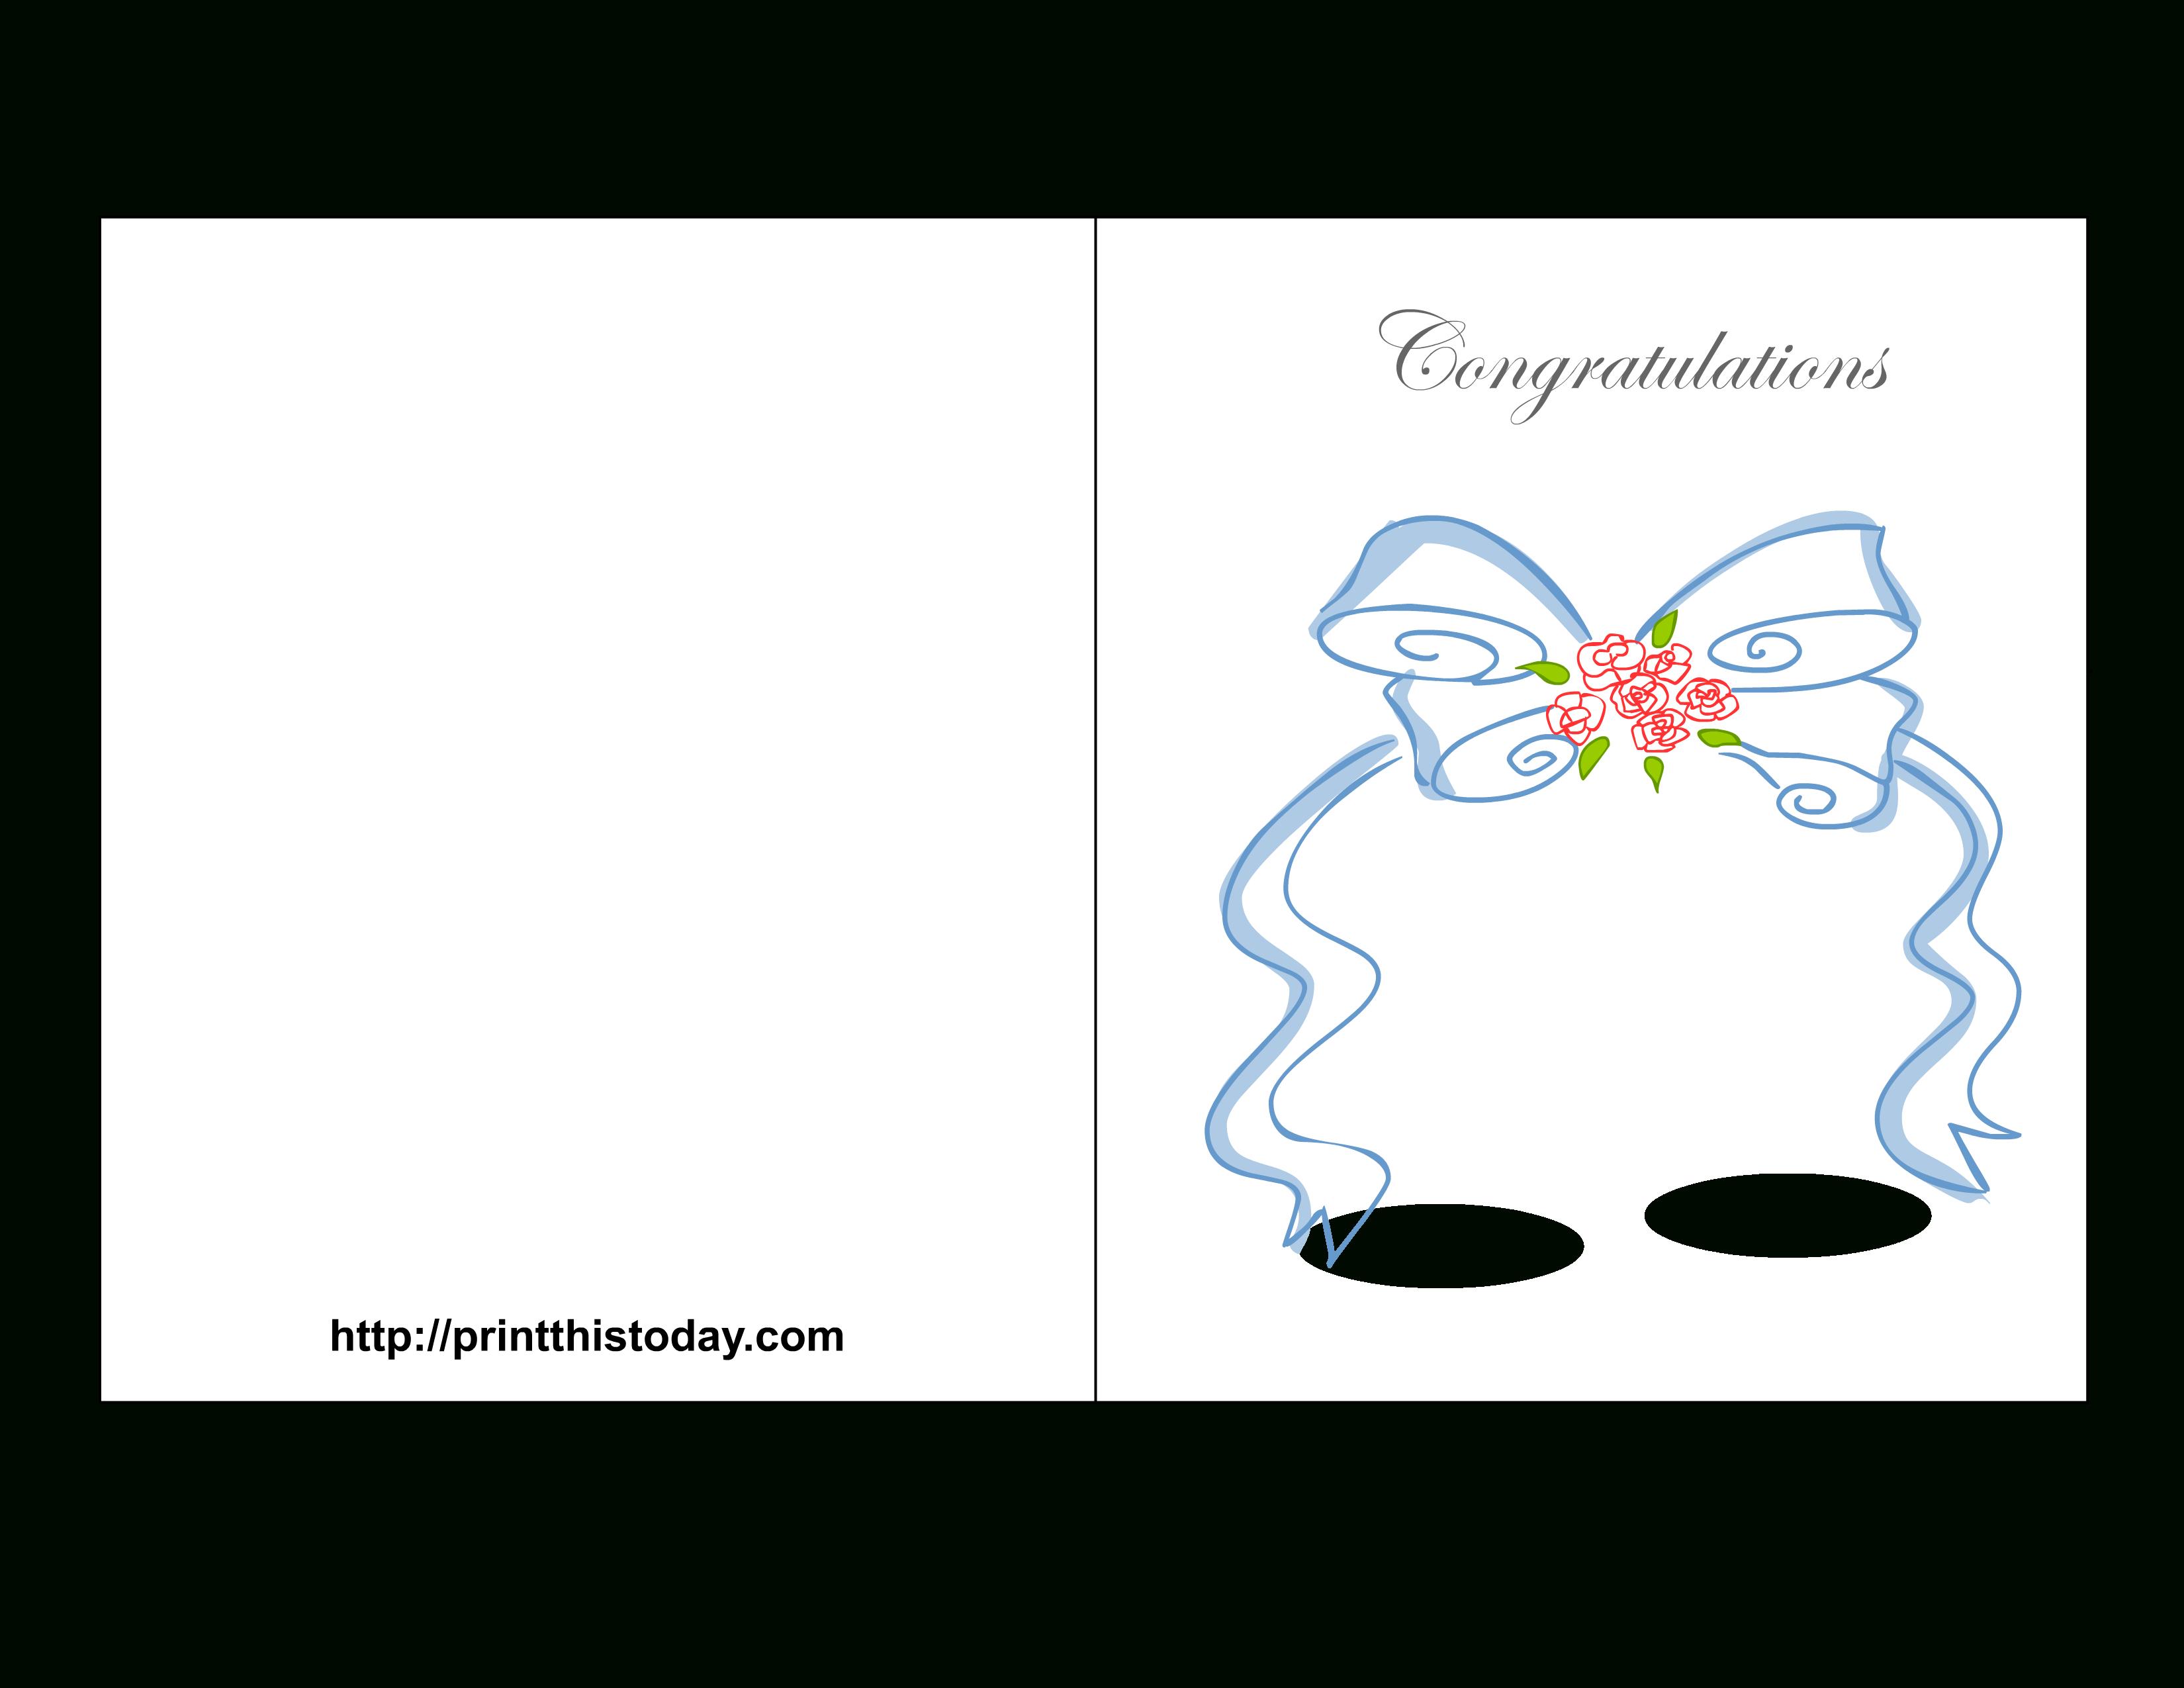 Free Printable Wedding Congratulations Cards - Free Printable Wedding Cards